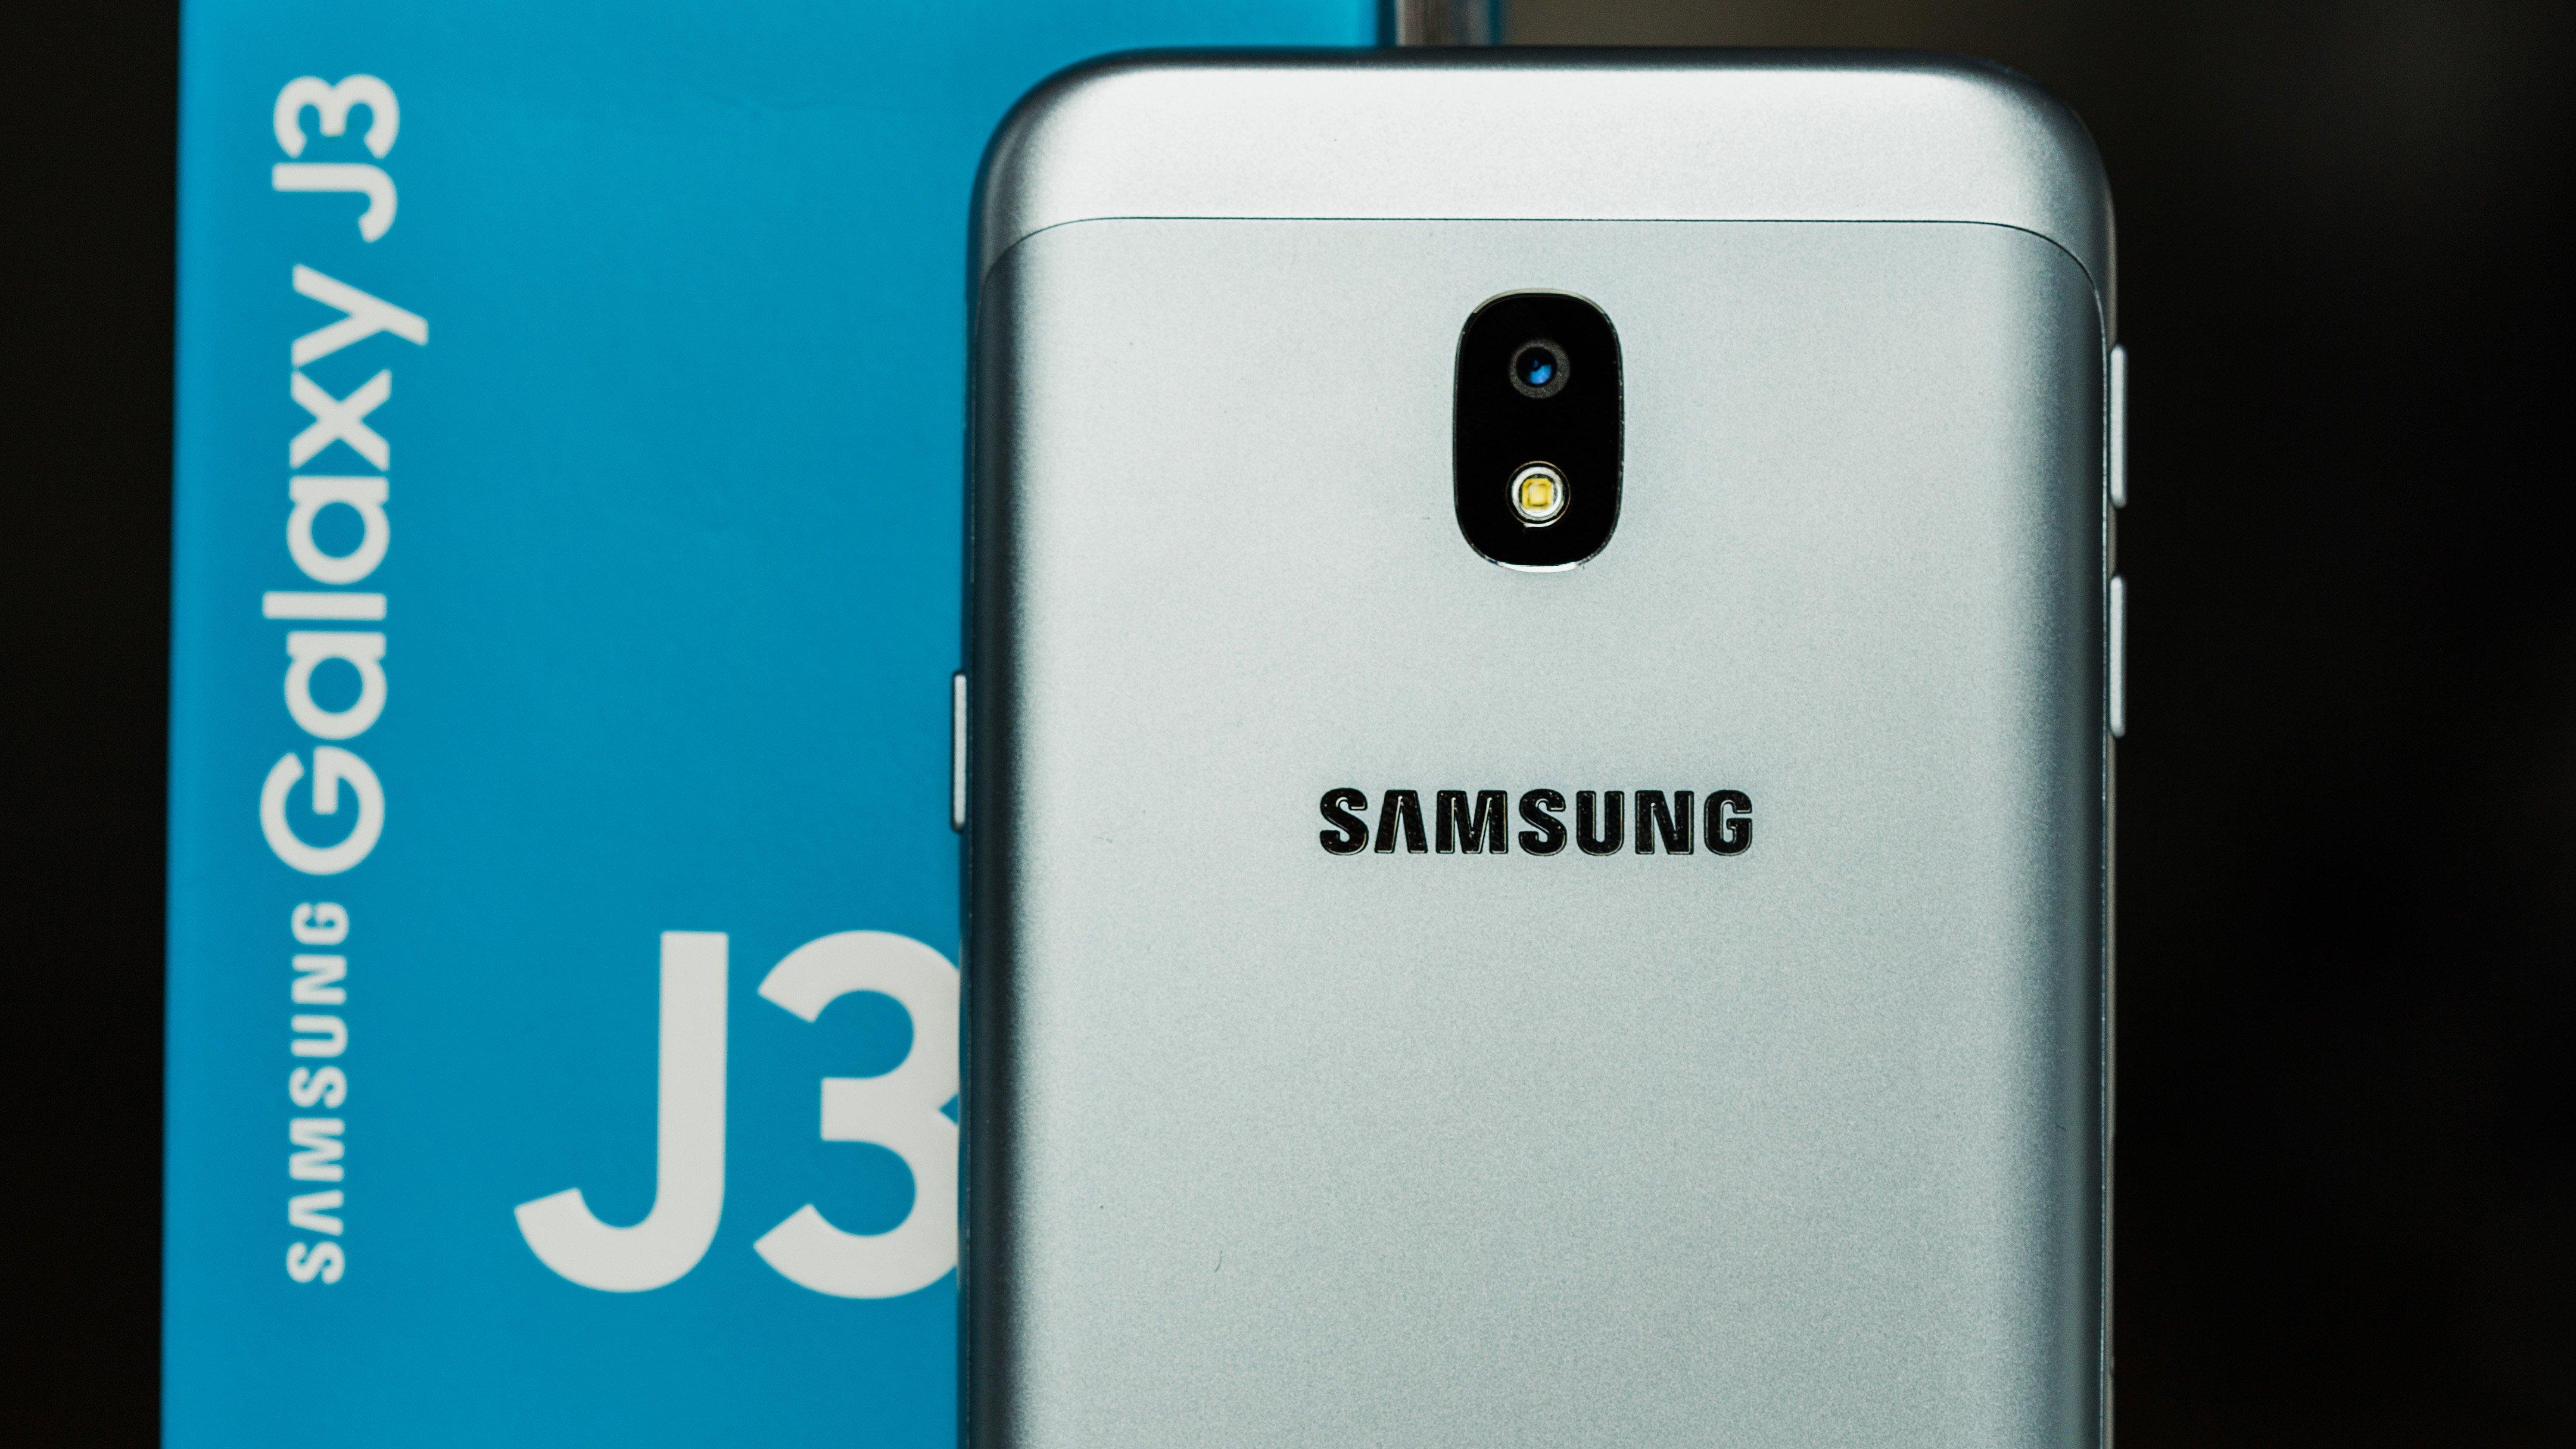 How to Unlock Samsung Galaxy J3 (2017) - Unlock Code - Fast